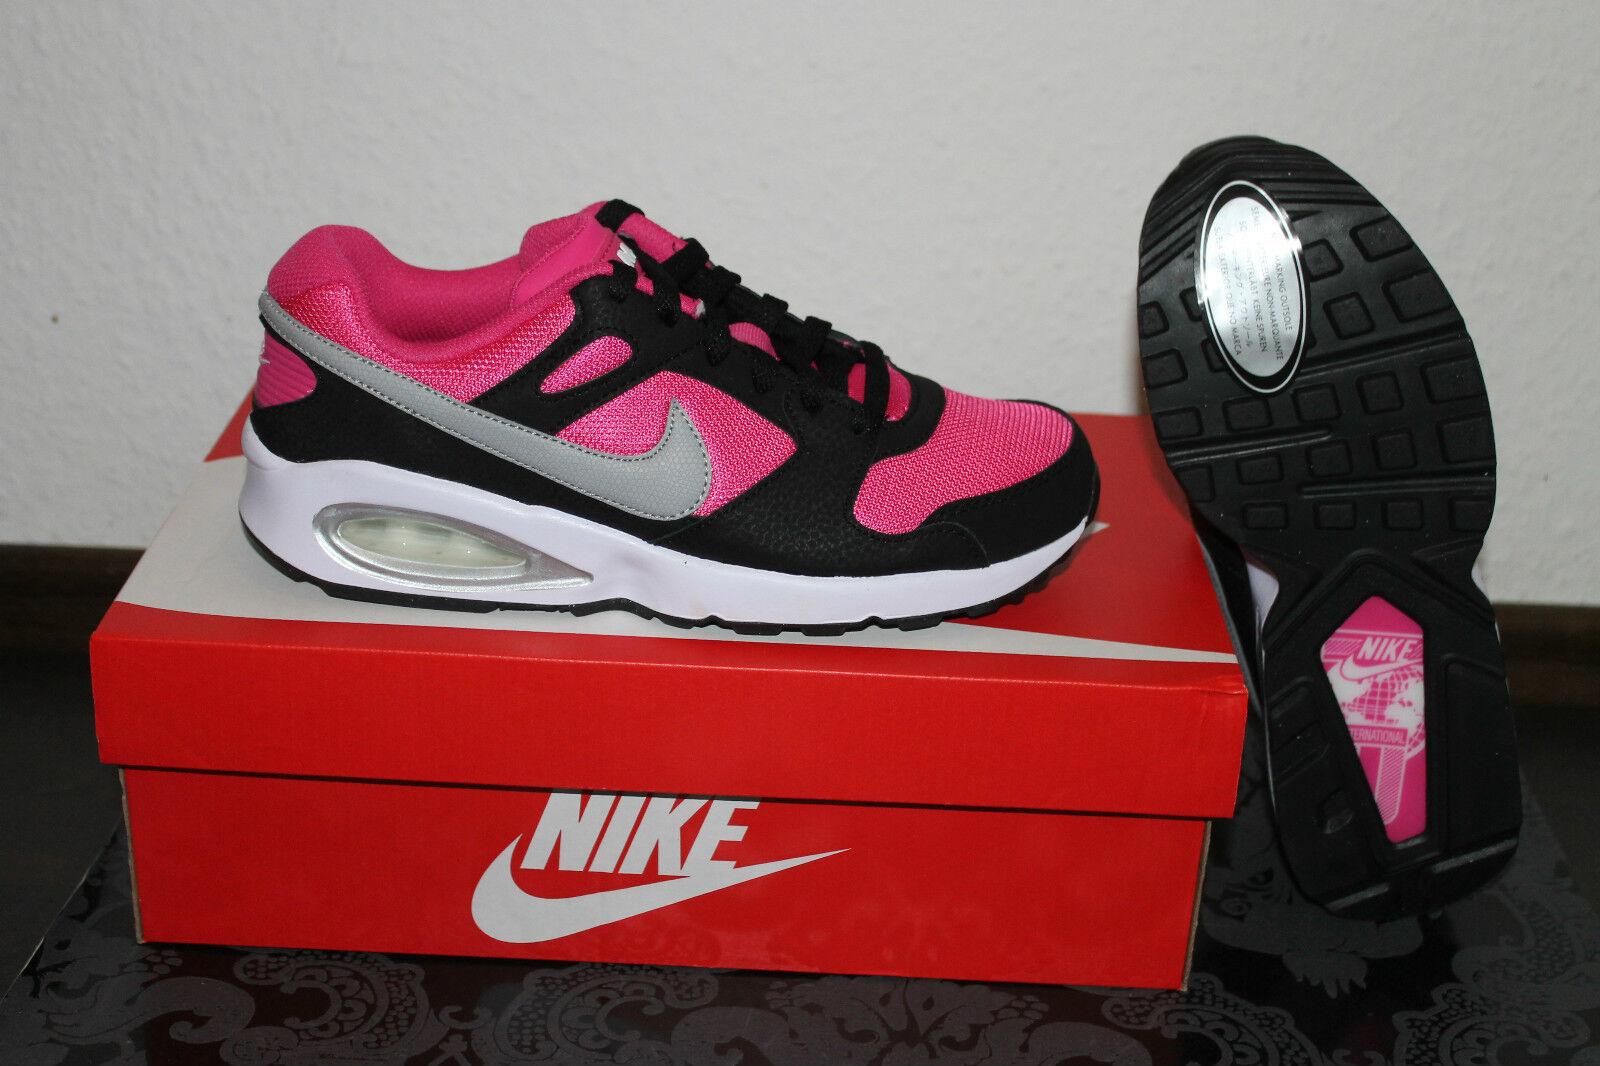 quality design df97d e574f Nike Air Max Coliseum señora running running running zapatos negro rosa  tamaño 38 o 38,